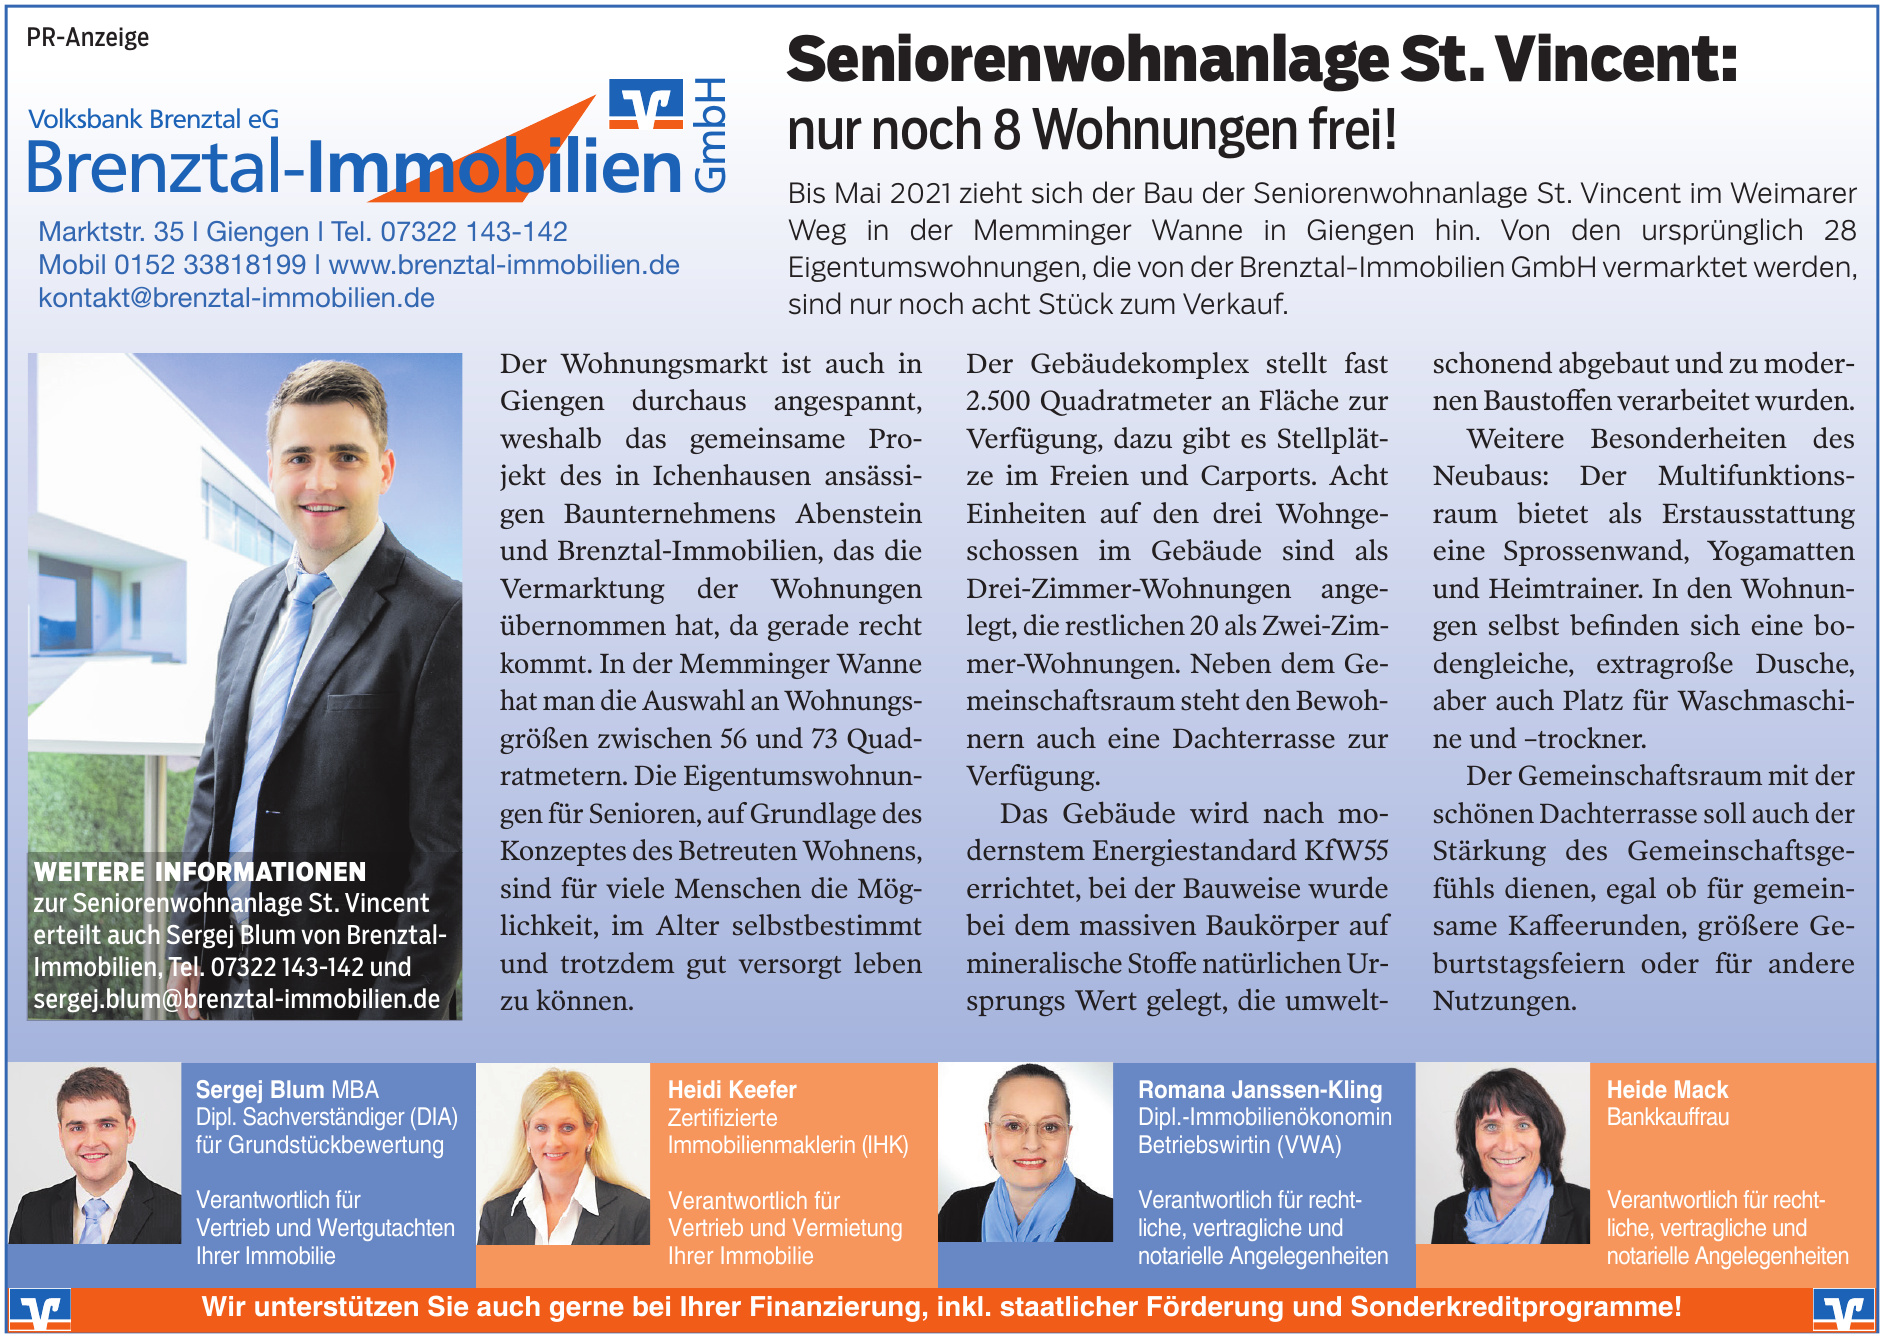 Brenztal - Immobilien GmbH